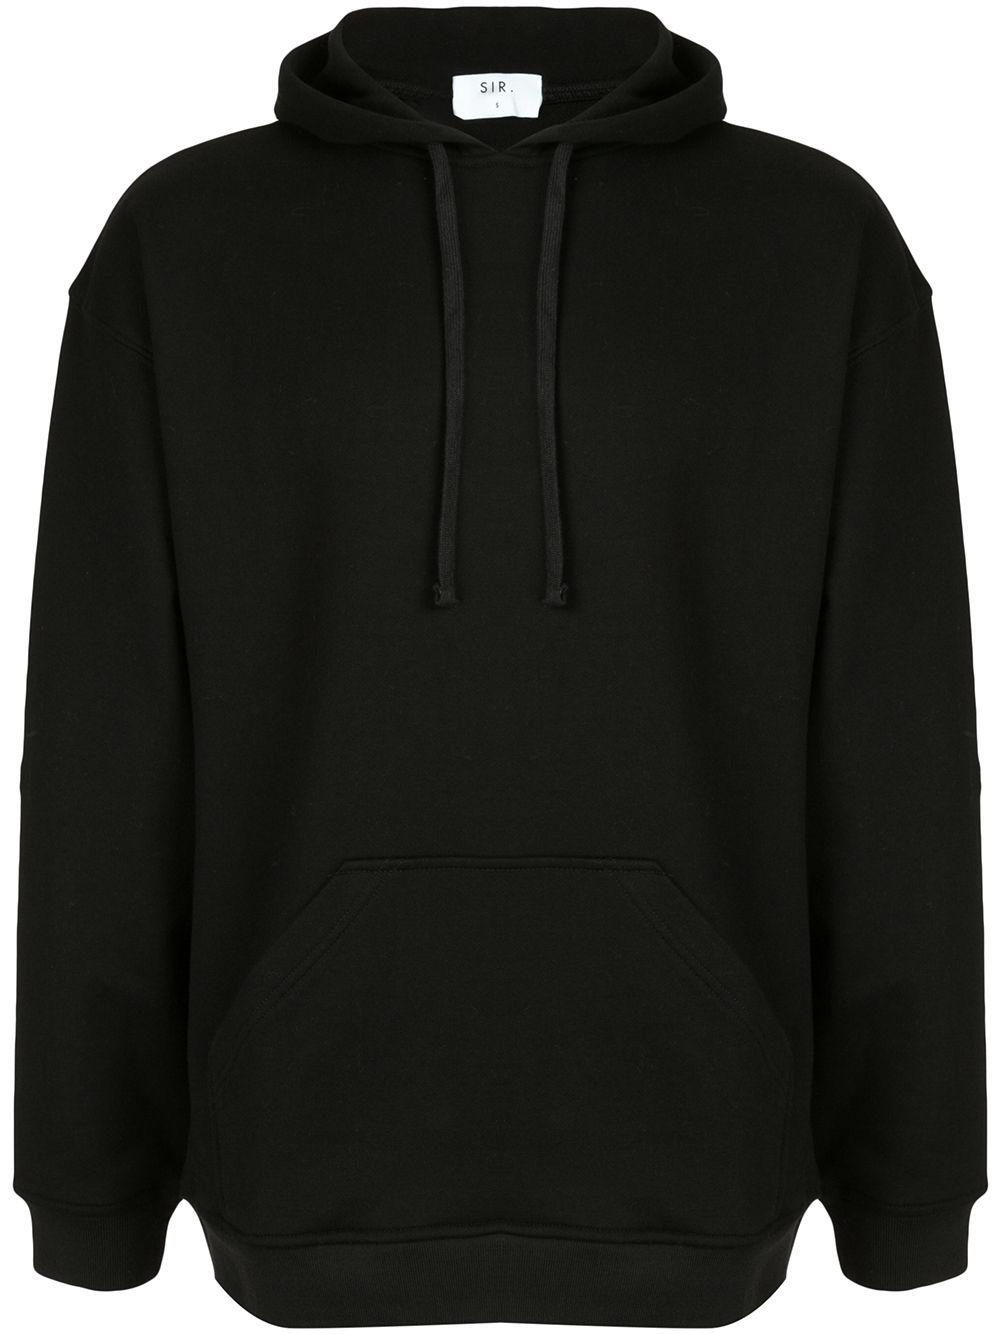 Sir Oversized Drawstring Hoodie Black In 2021 Plain Black Hoodie Black Hoodie Outfit Plain Black Sweatshirt [ 1334 x 1000 Pixel ]